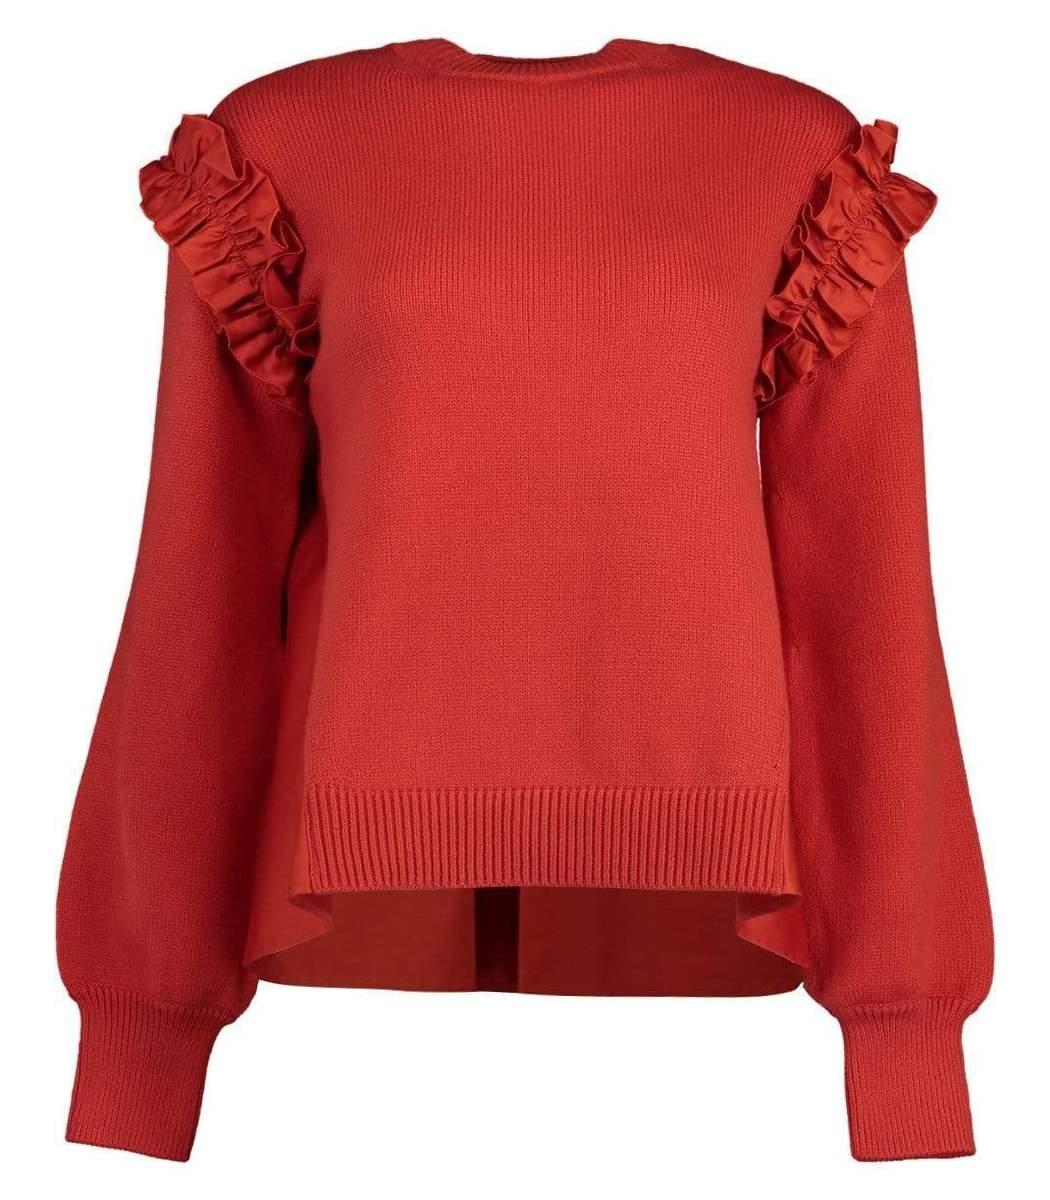 Adeam Red Ruffle Sweater